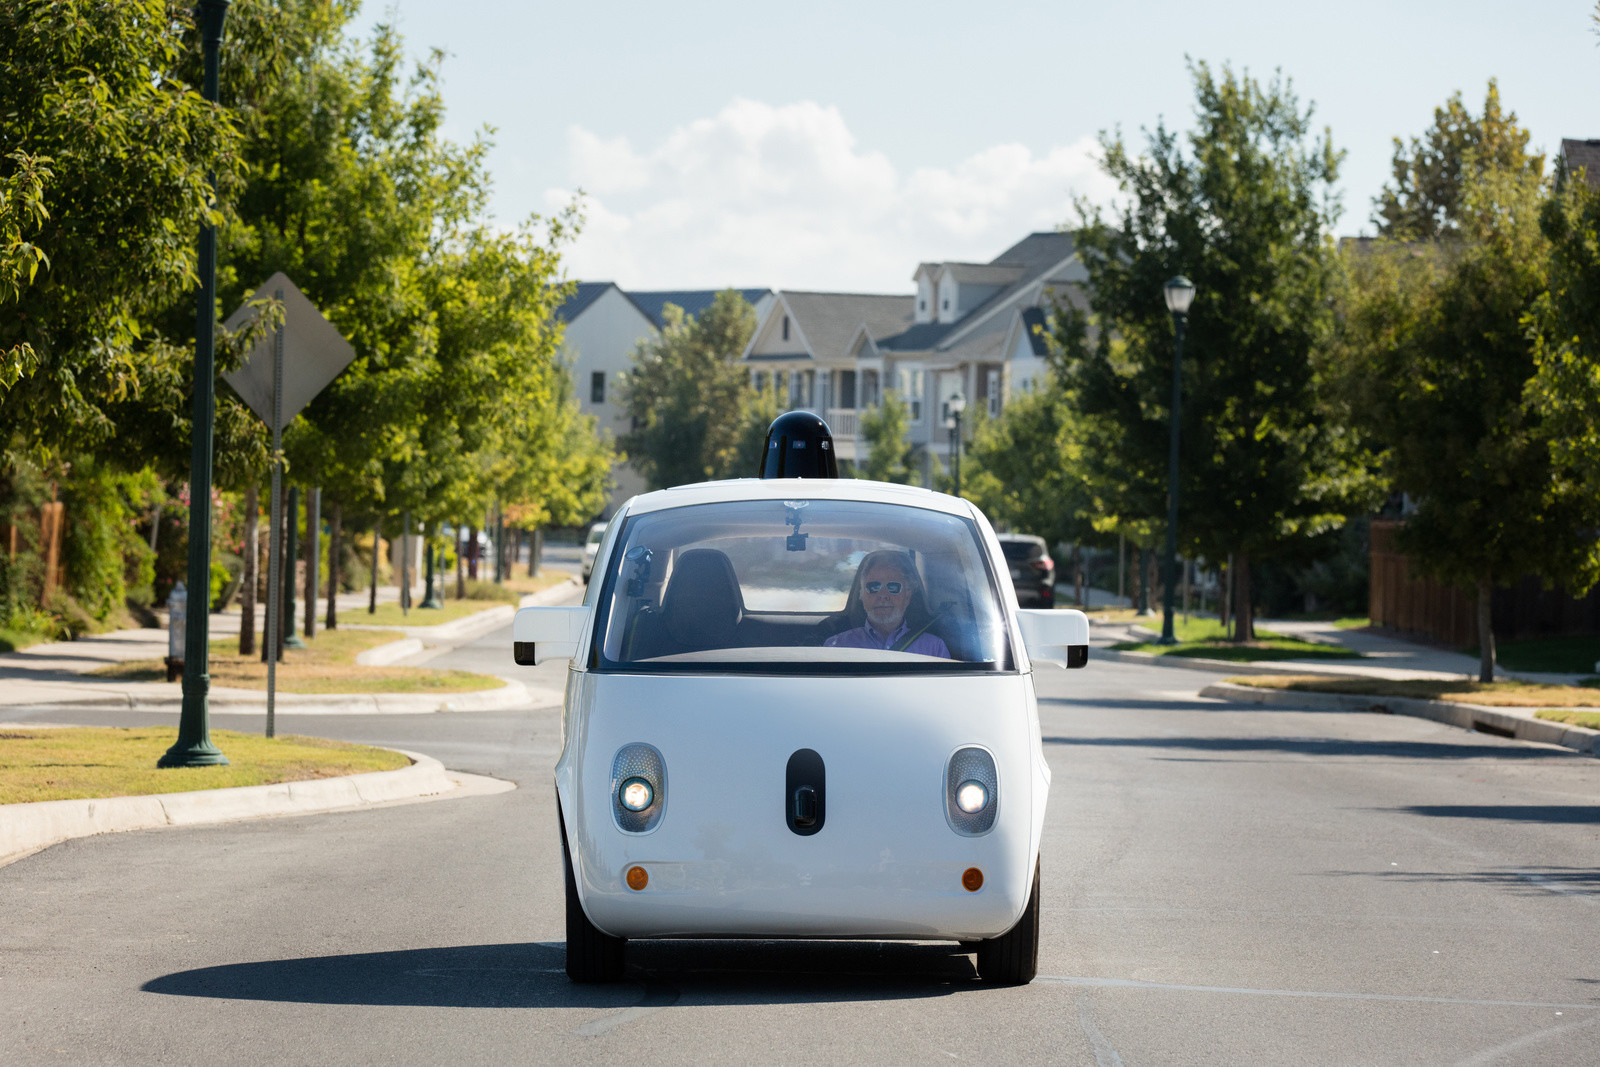 Google waymo self-driving car